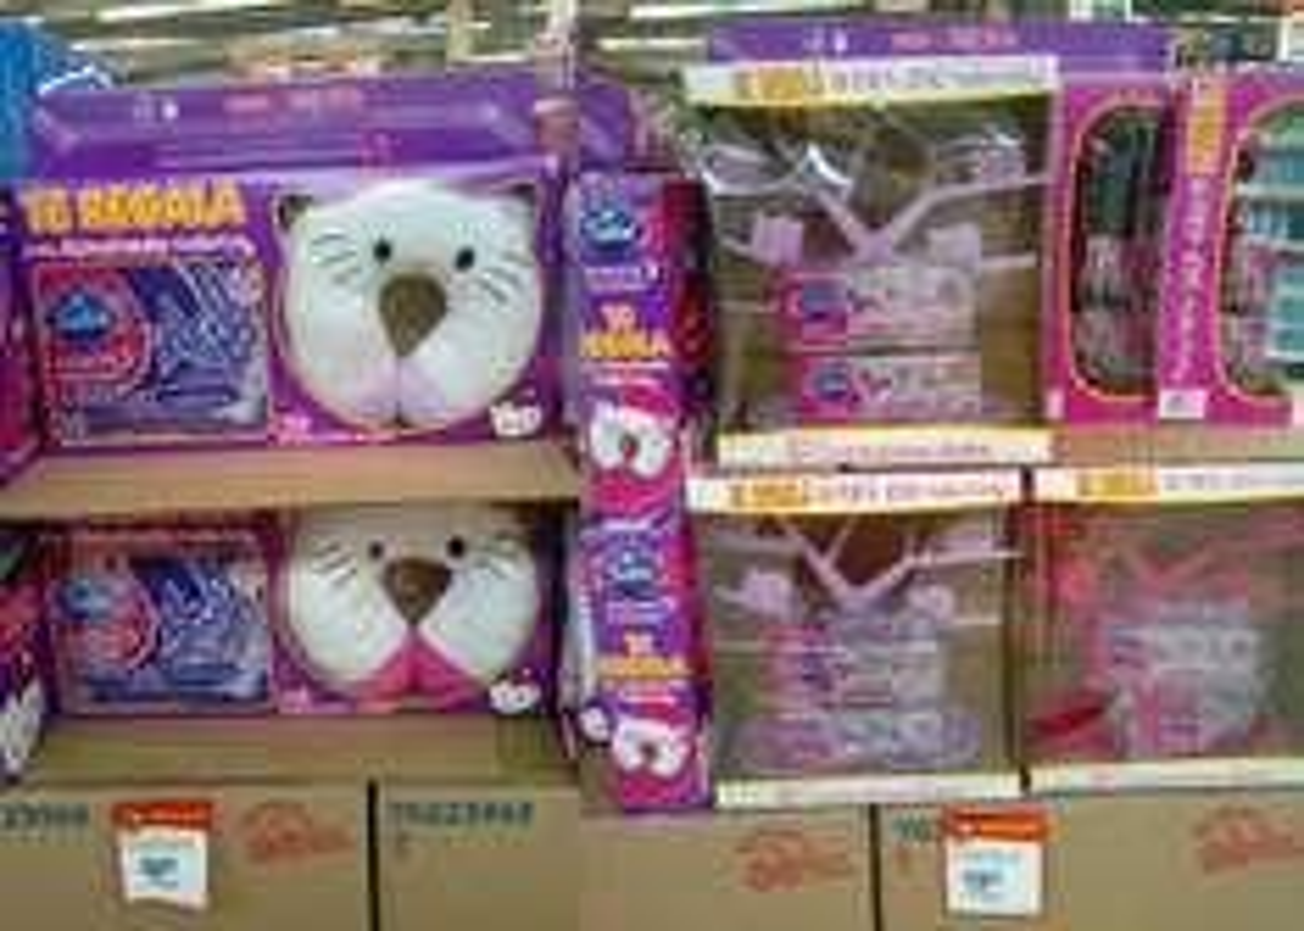 Walmart: Almohada de viaje o Porta Joyas de Hello Kitty en la compra de toallas femeninas Saba